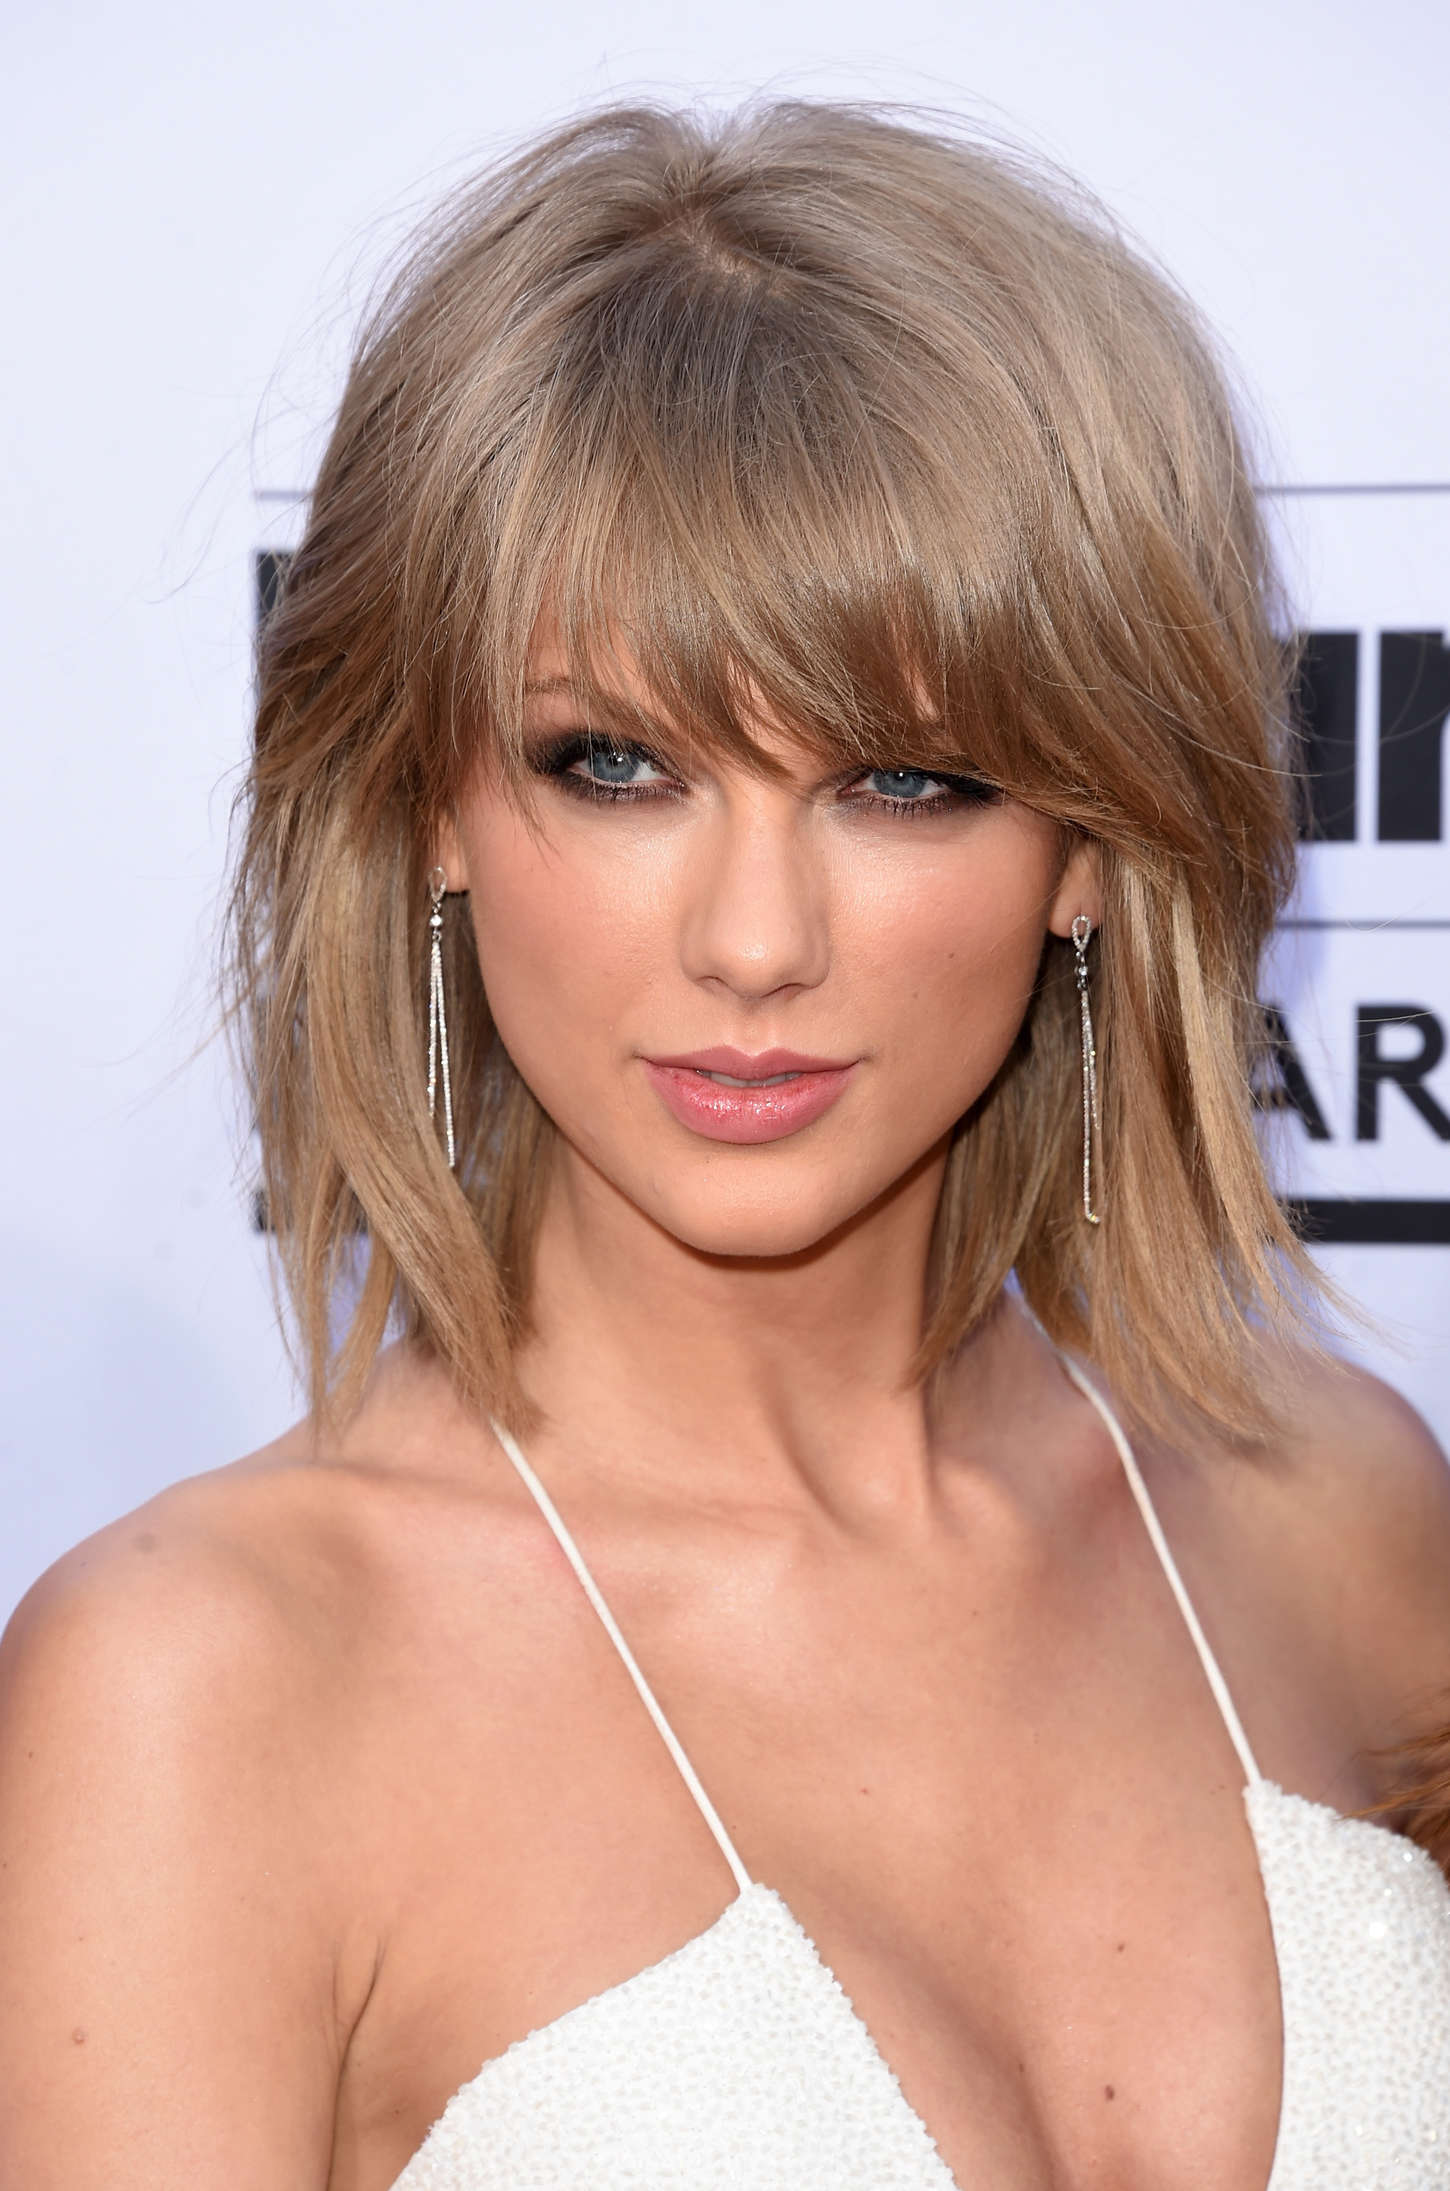 Taylor Swift : Billboard Music Awards 2015 -04 - GotCeleb